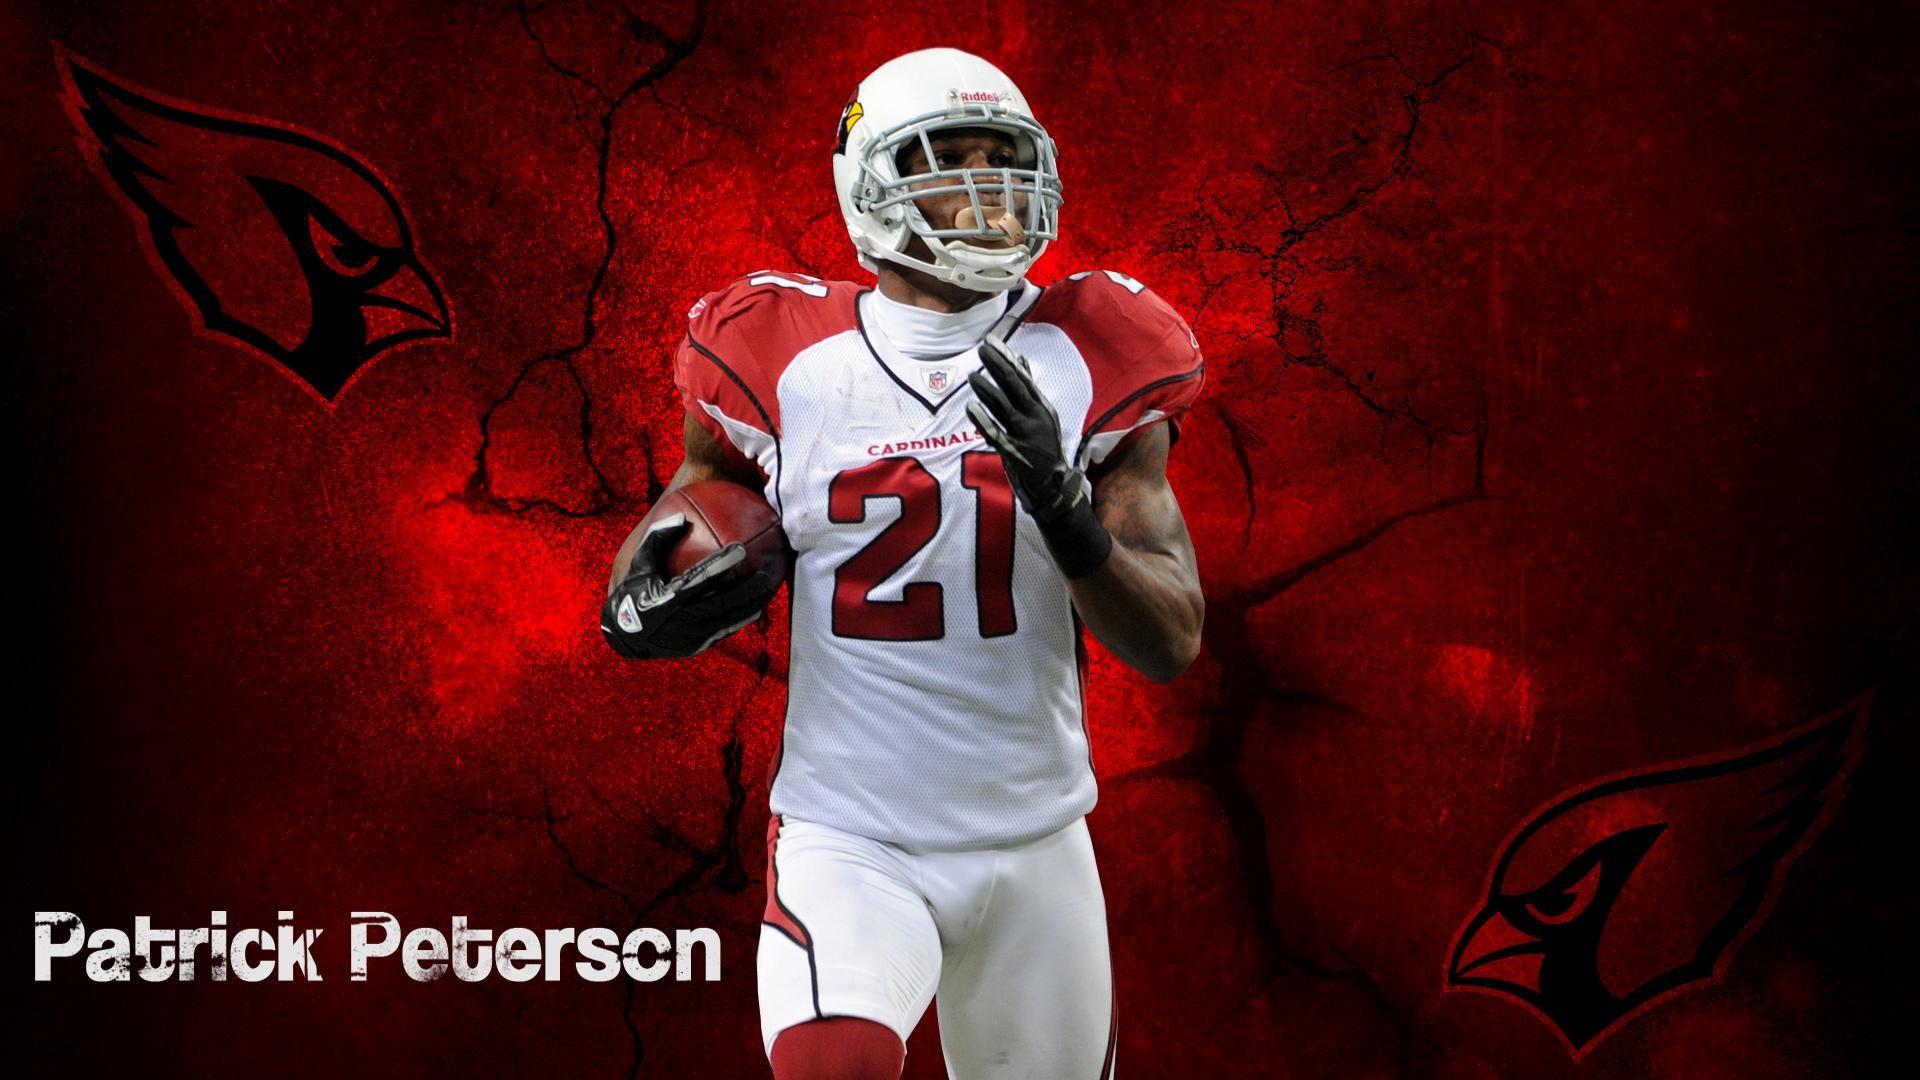 Patrick-Peterson-Arizona-Cardinals-Wallpaper